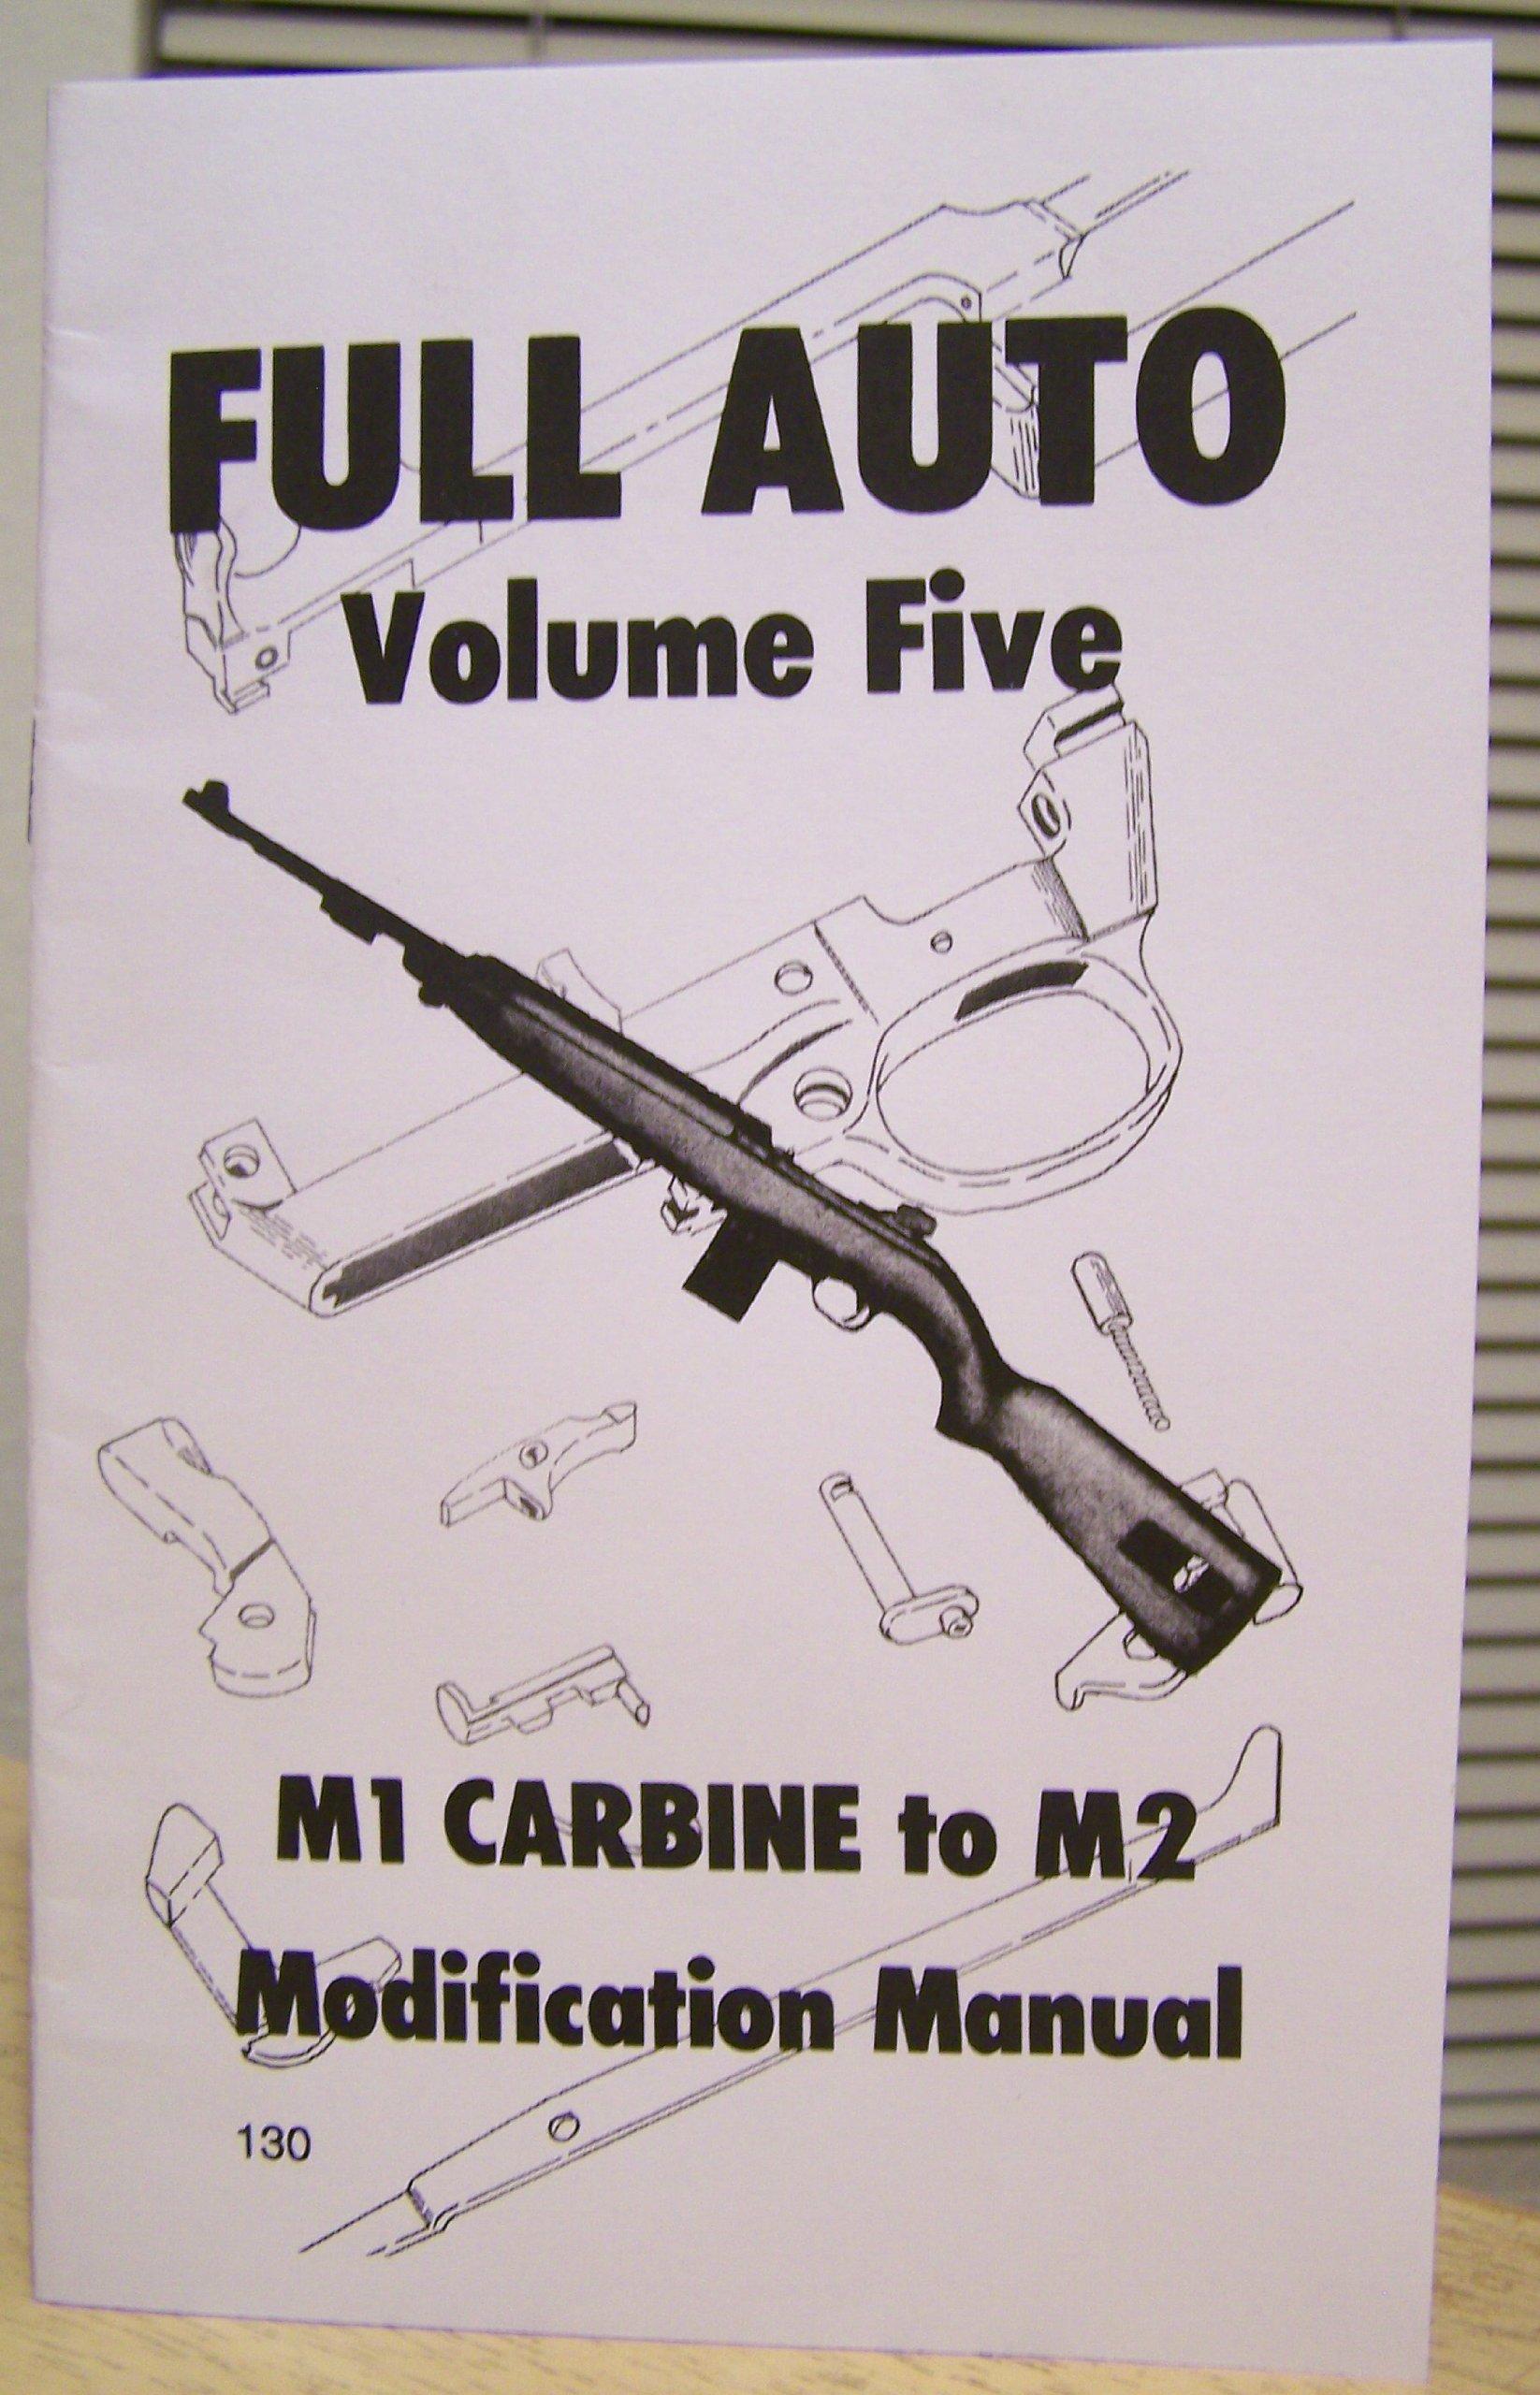 M1 CARBINE TO M2 CONVERSION MODIFICATION MANUAL FULL AUTO MACHINE GUNS  MACHINIST DRAWINGS: DESERT PUBLICATIONS: Amazon.com: Books